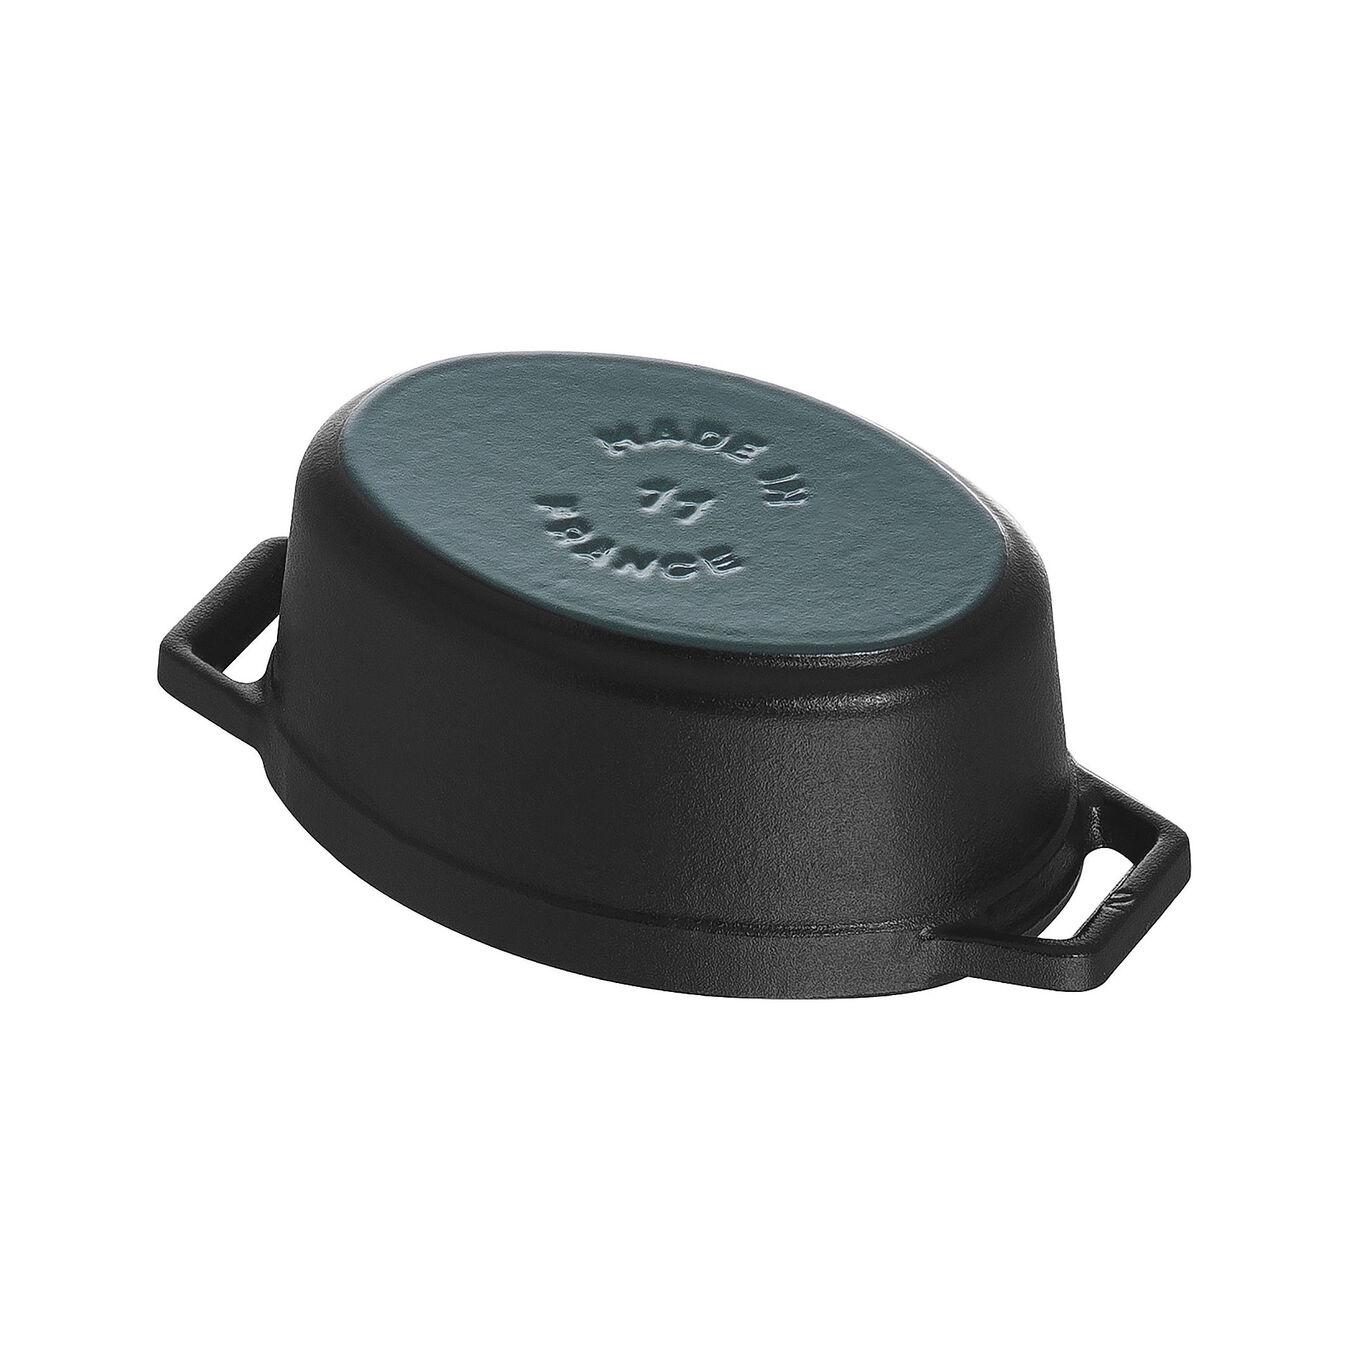 Mini cocotte ovale - 11 cm, nero,,large 5